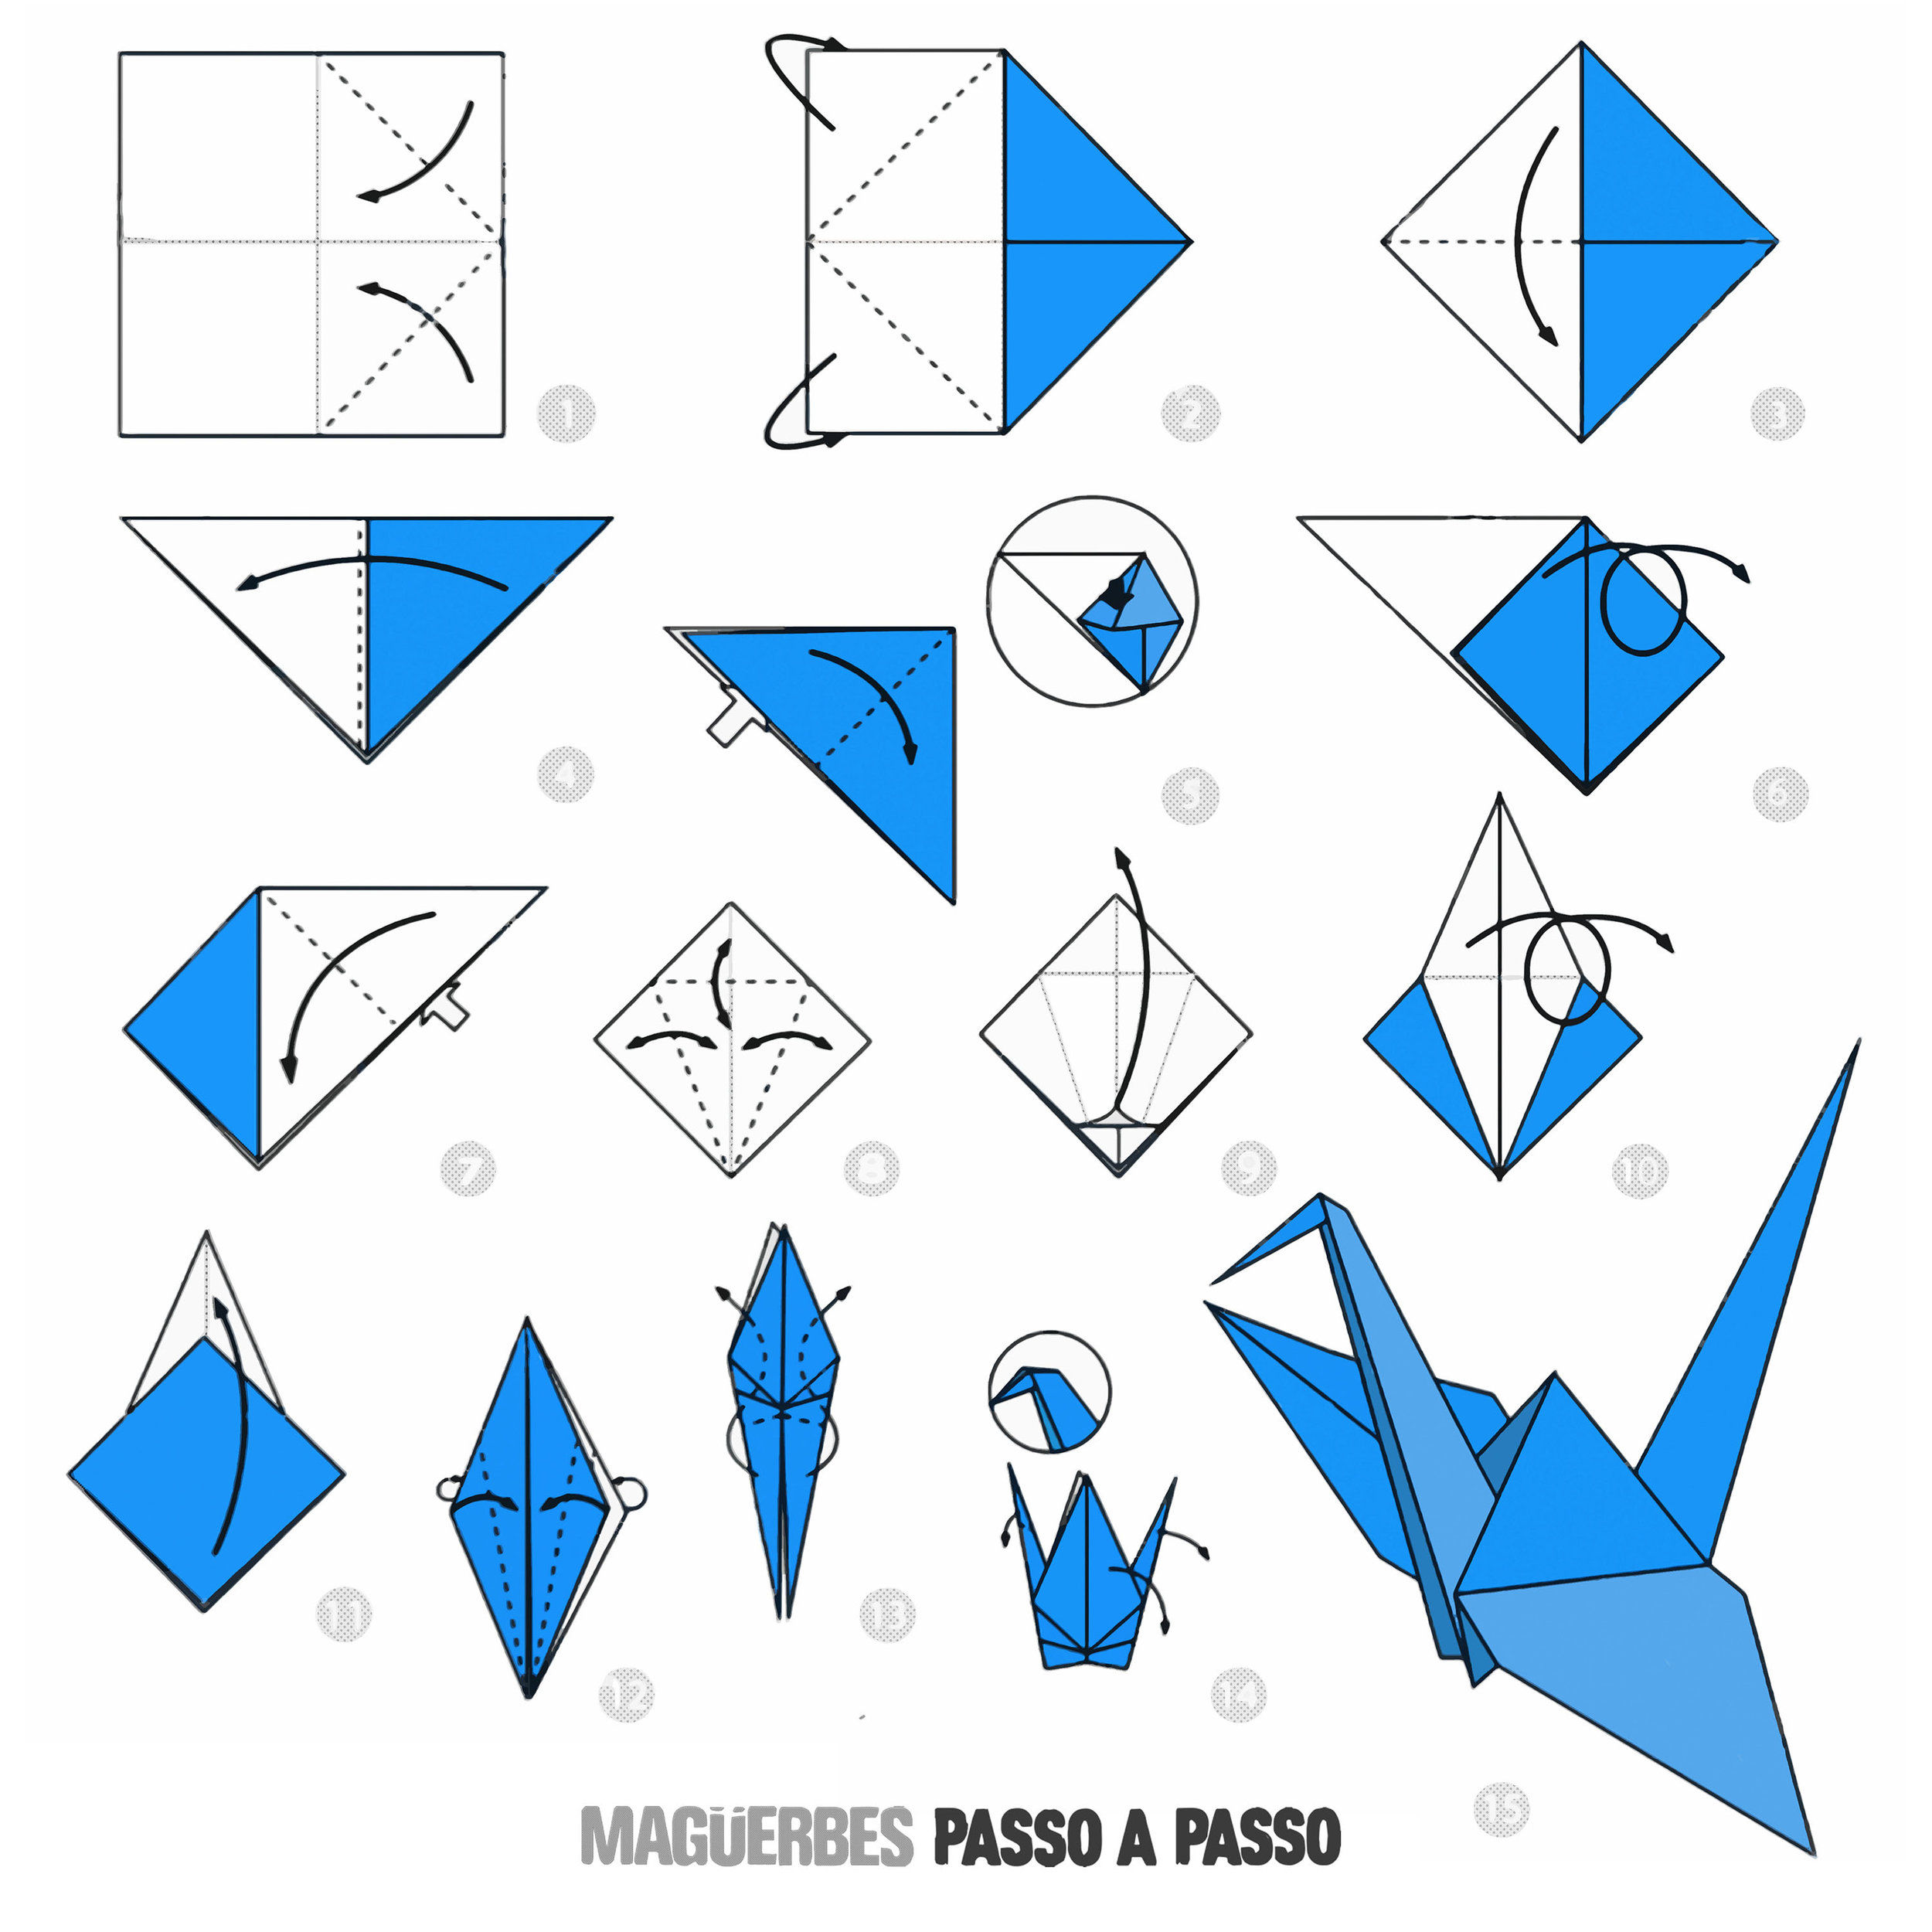 Maguerbes_PassoAPasso_Reduzido.jpg